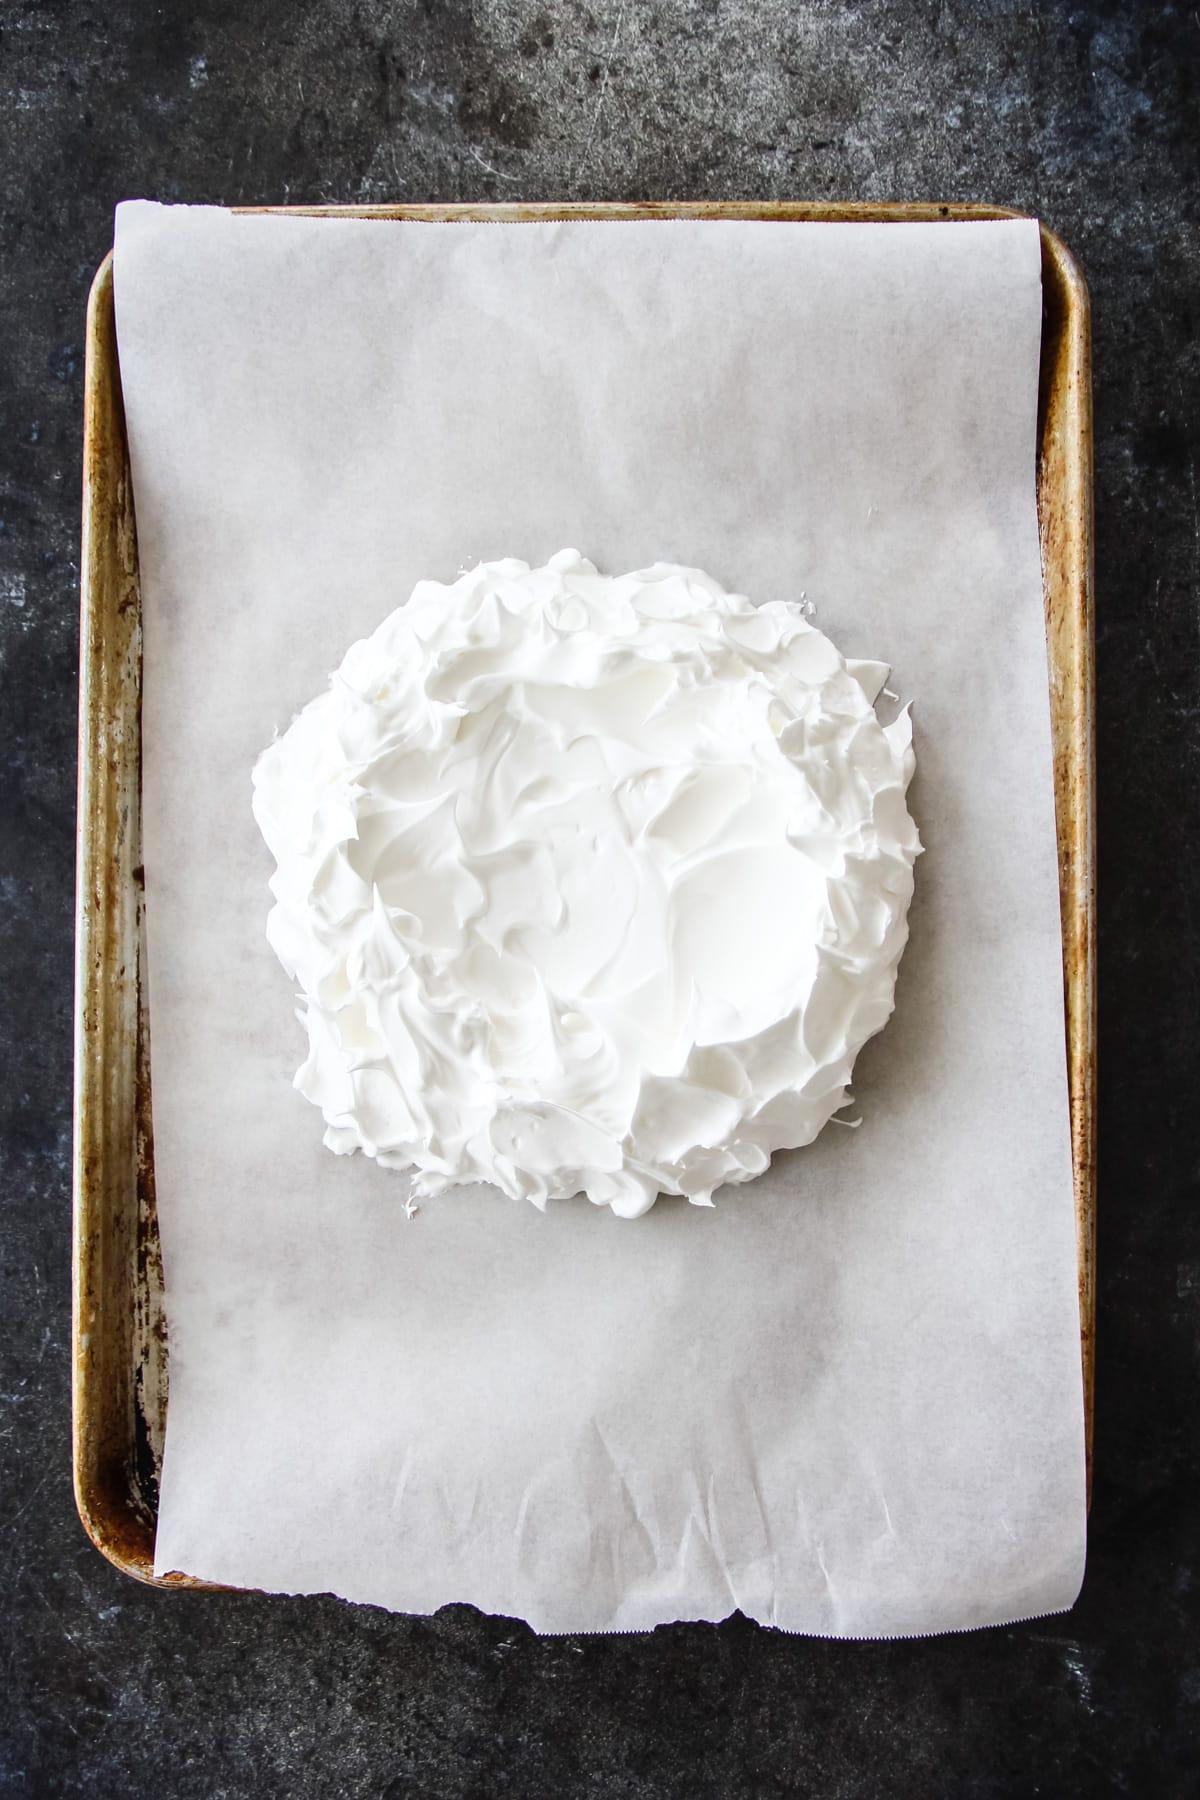 a top down view of a Pavlova meringue